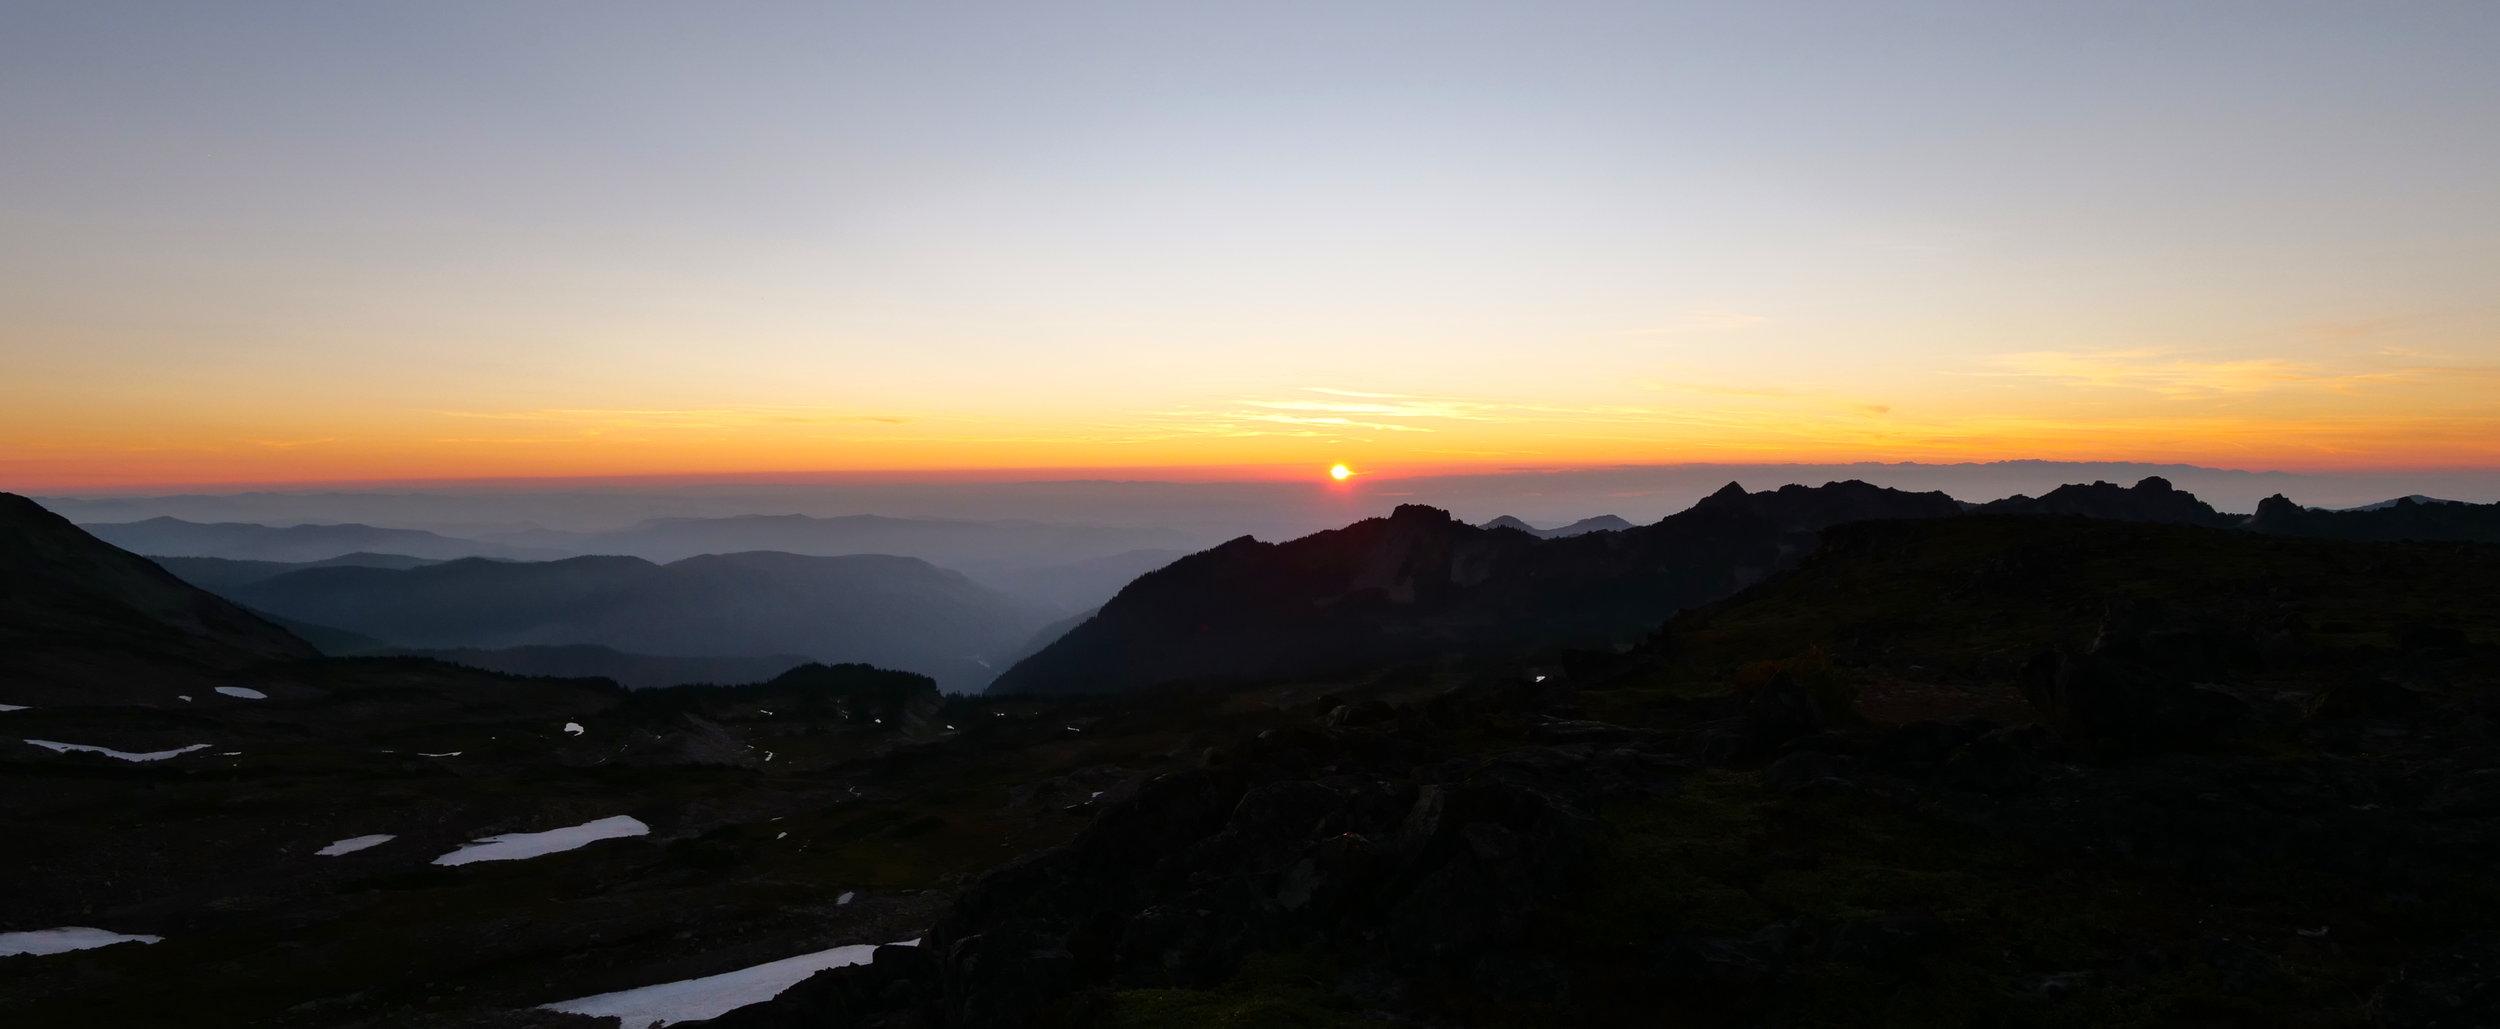 Sunset at 6700'